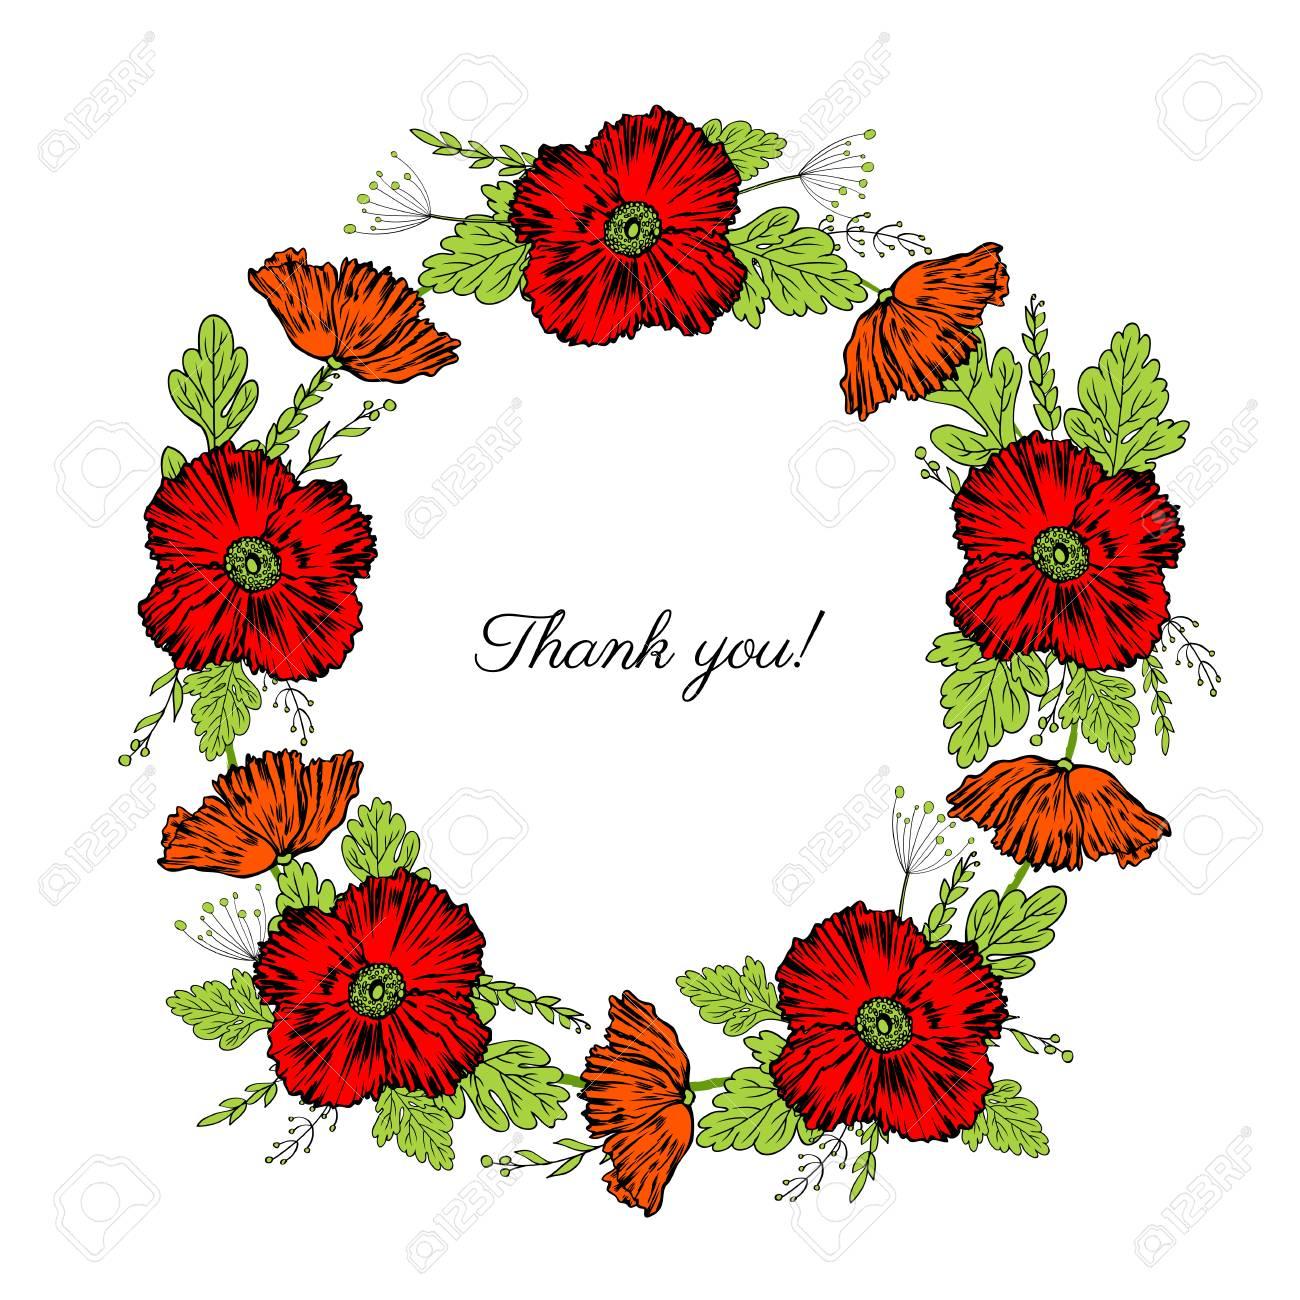 Red poppy flowers leaves floral wreath isolated on a white red poppy flowers leaves floral wreath isolated on a white background round frame hand mightylinksfo